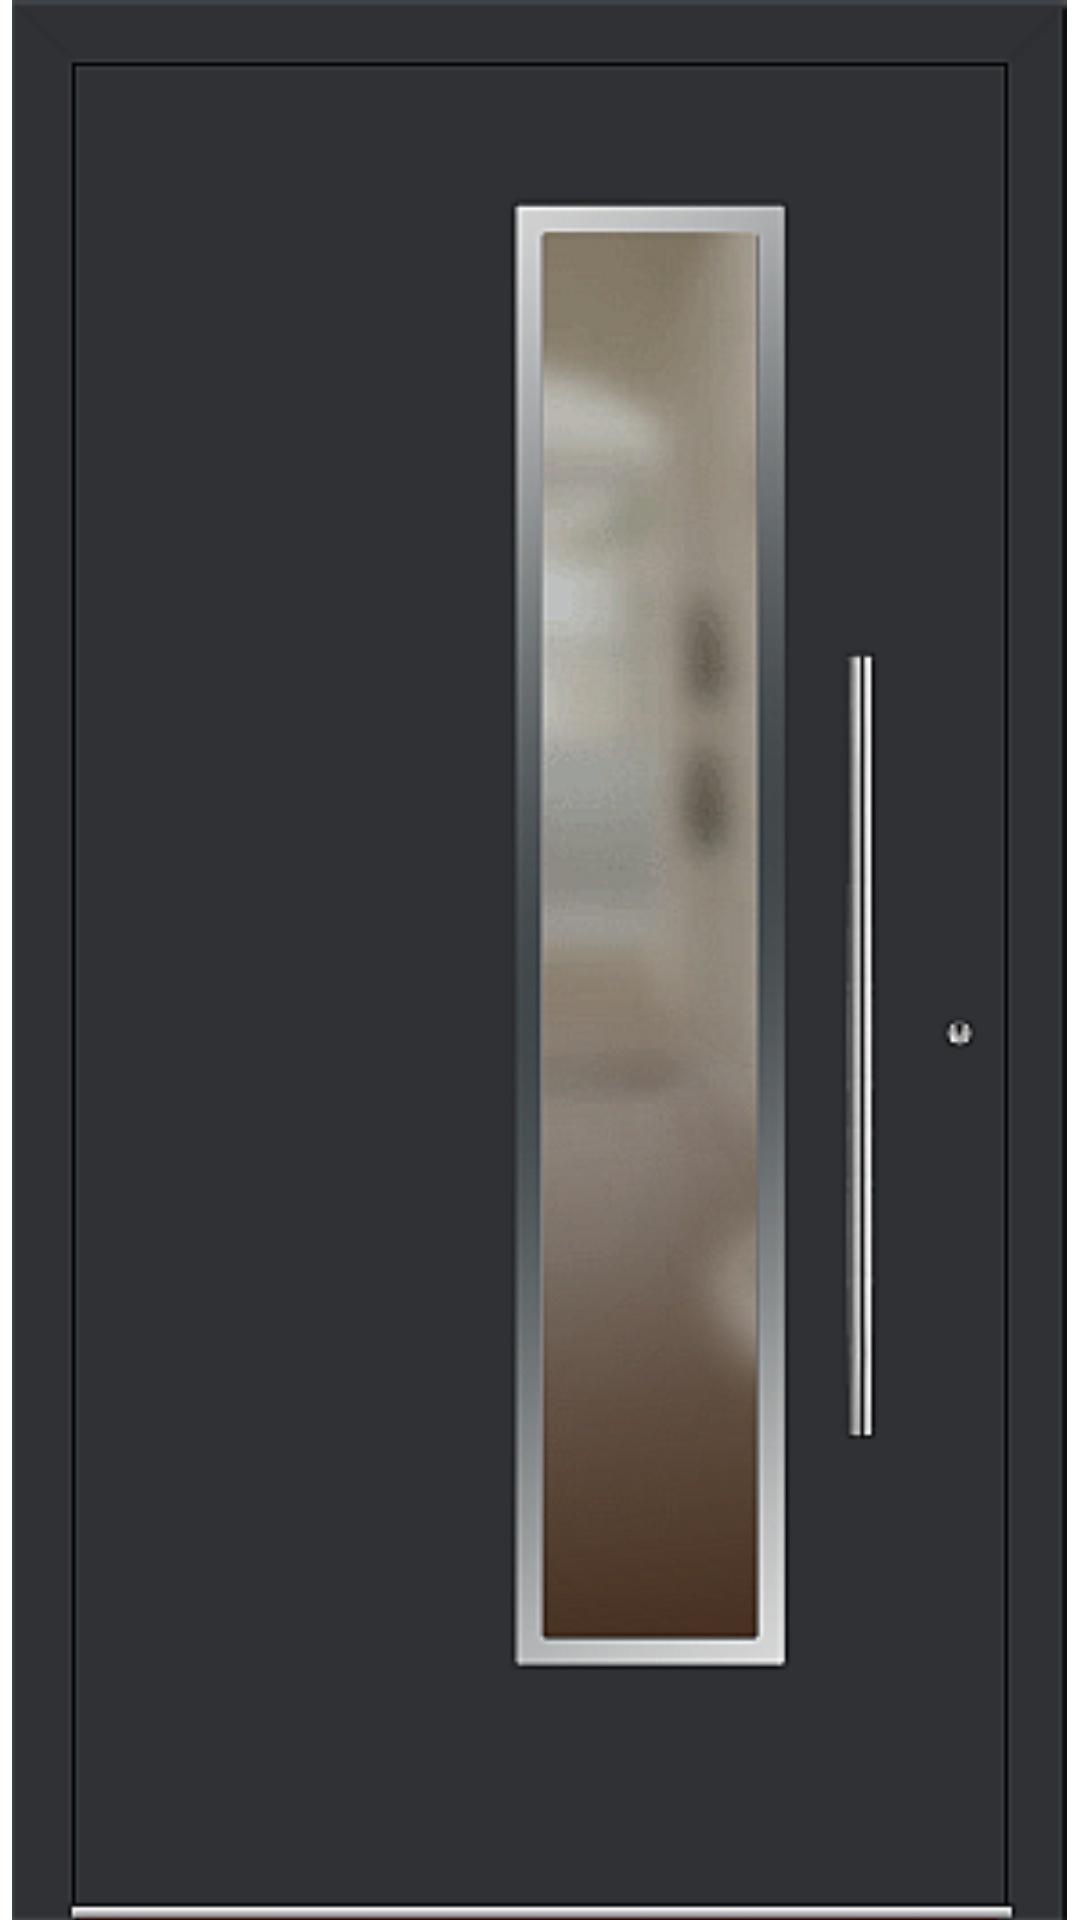 PaXentrée Aluminium Haustür M01231 schwarz